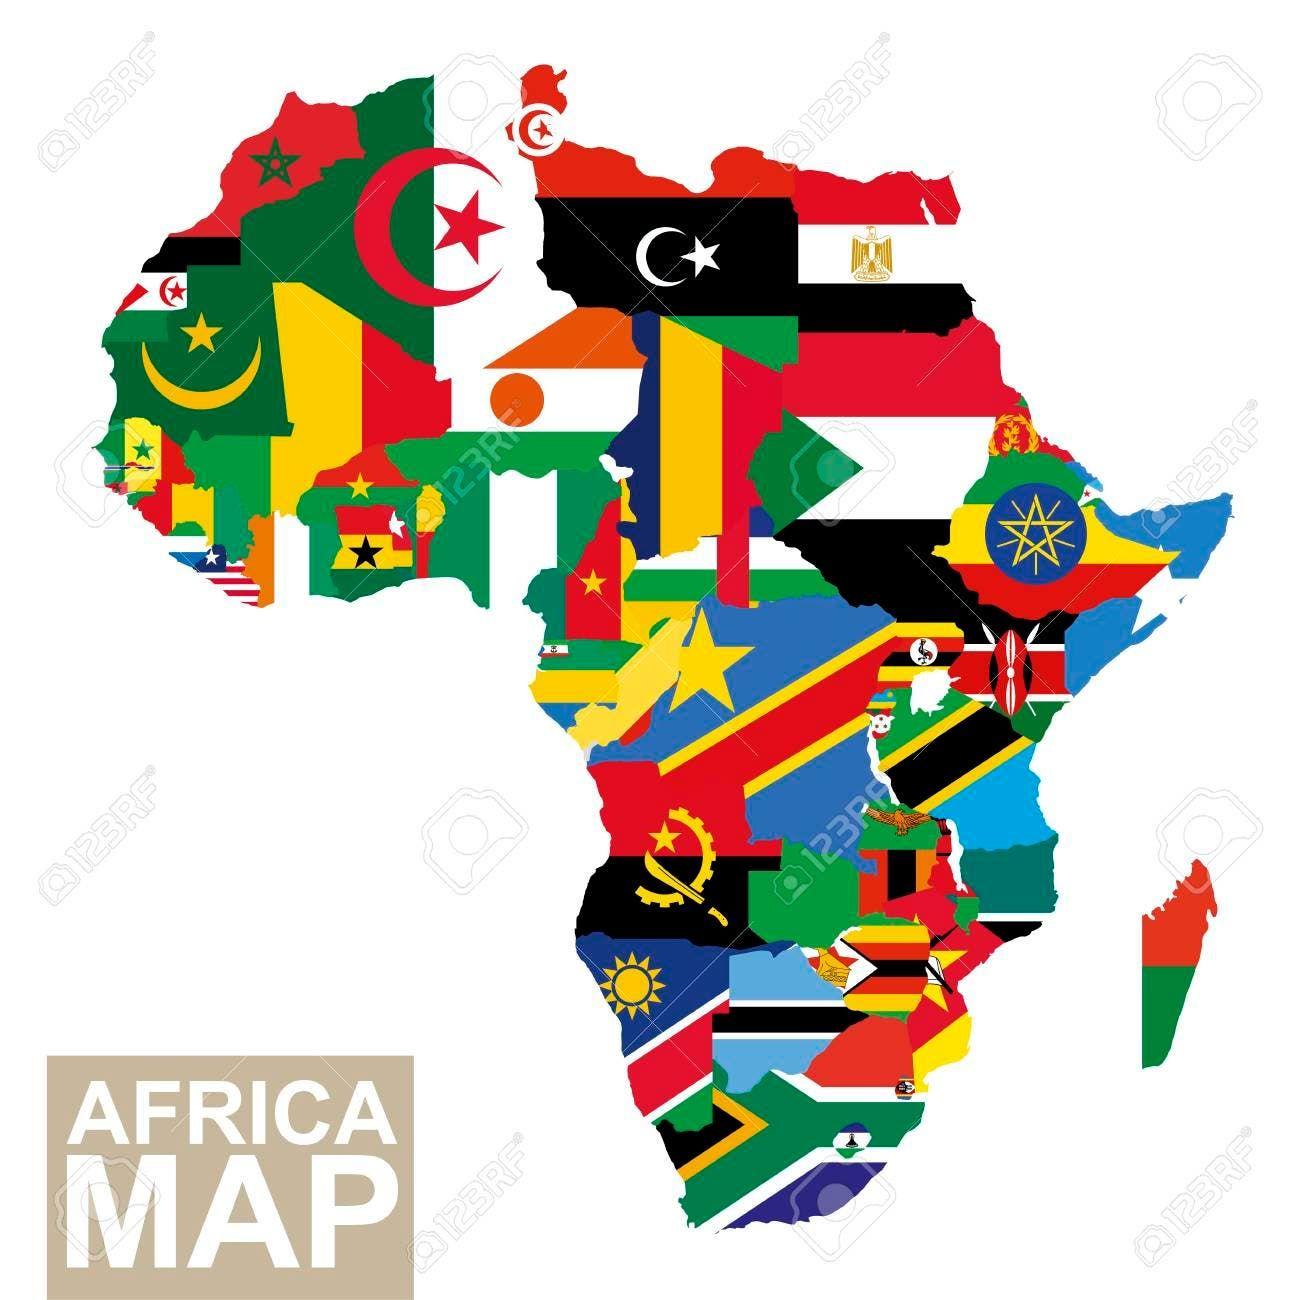 4 Major Protests Across Africa Endsars Zimbabweanlivesmatter Shutitalldown Congoisbleeding Vanguard N Africa Map Africa Celebrate Black History Month